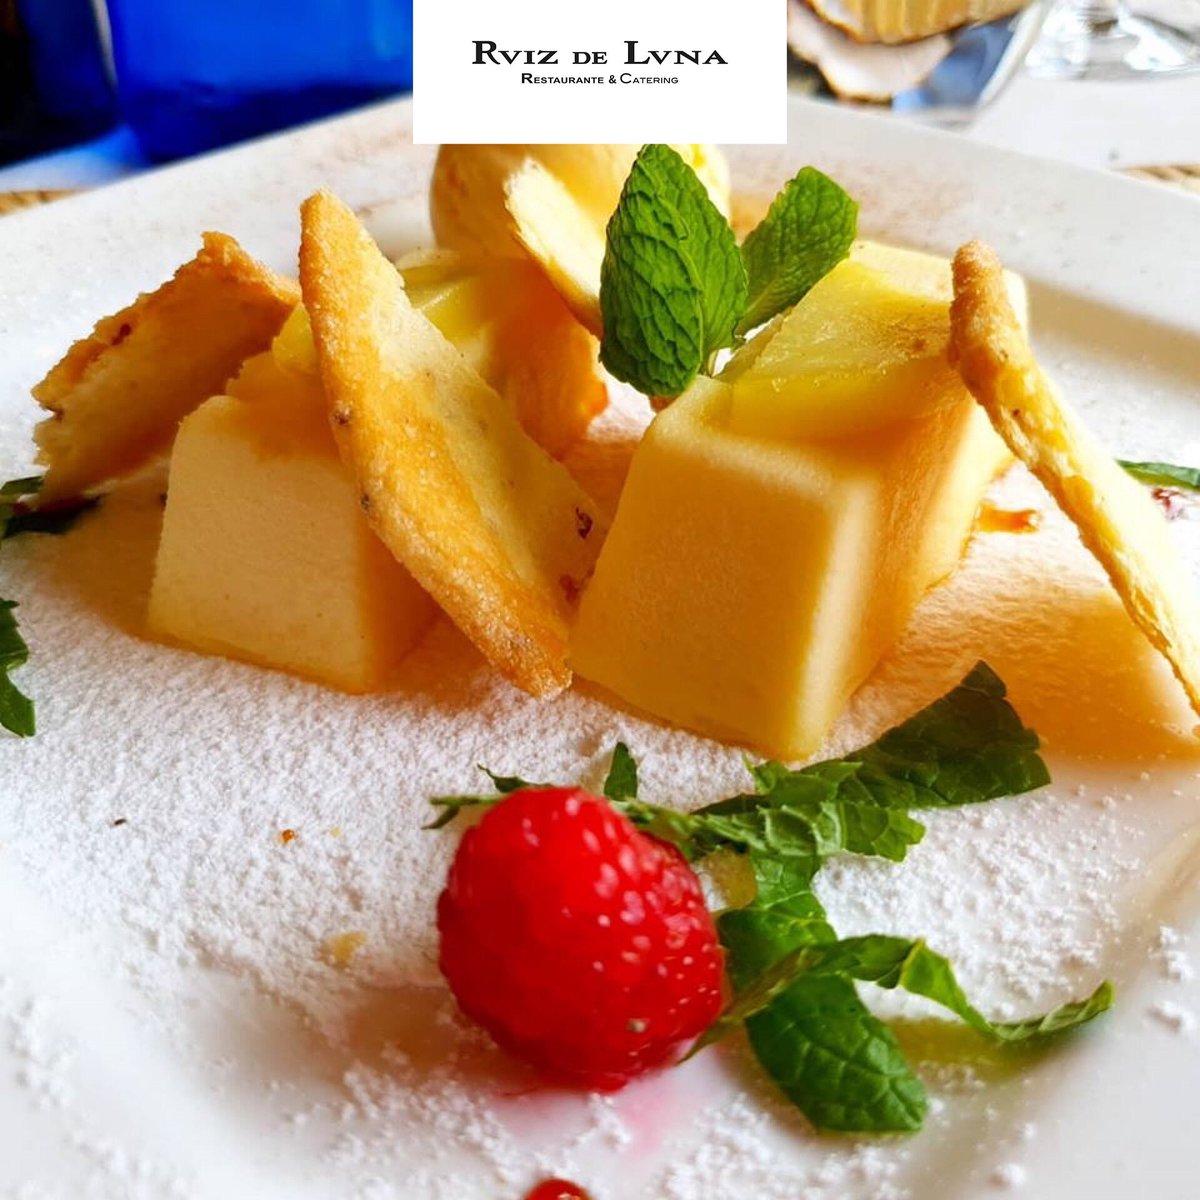 ❤️ Tarta de queso con gominolas de aove ❤️. . Foto @elpaladarerrante #tartadequeso #cheesecake #aove #food #foodpic #talaveradelareina #talavera #restauranteruizdeluna